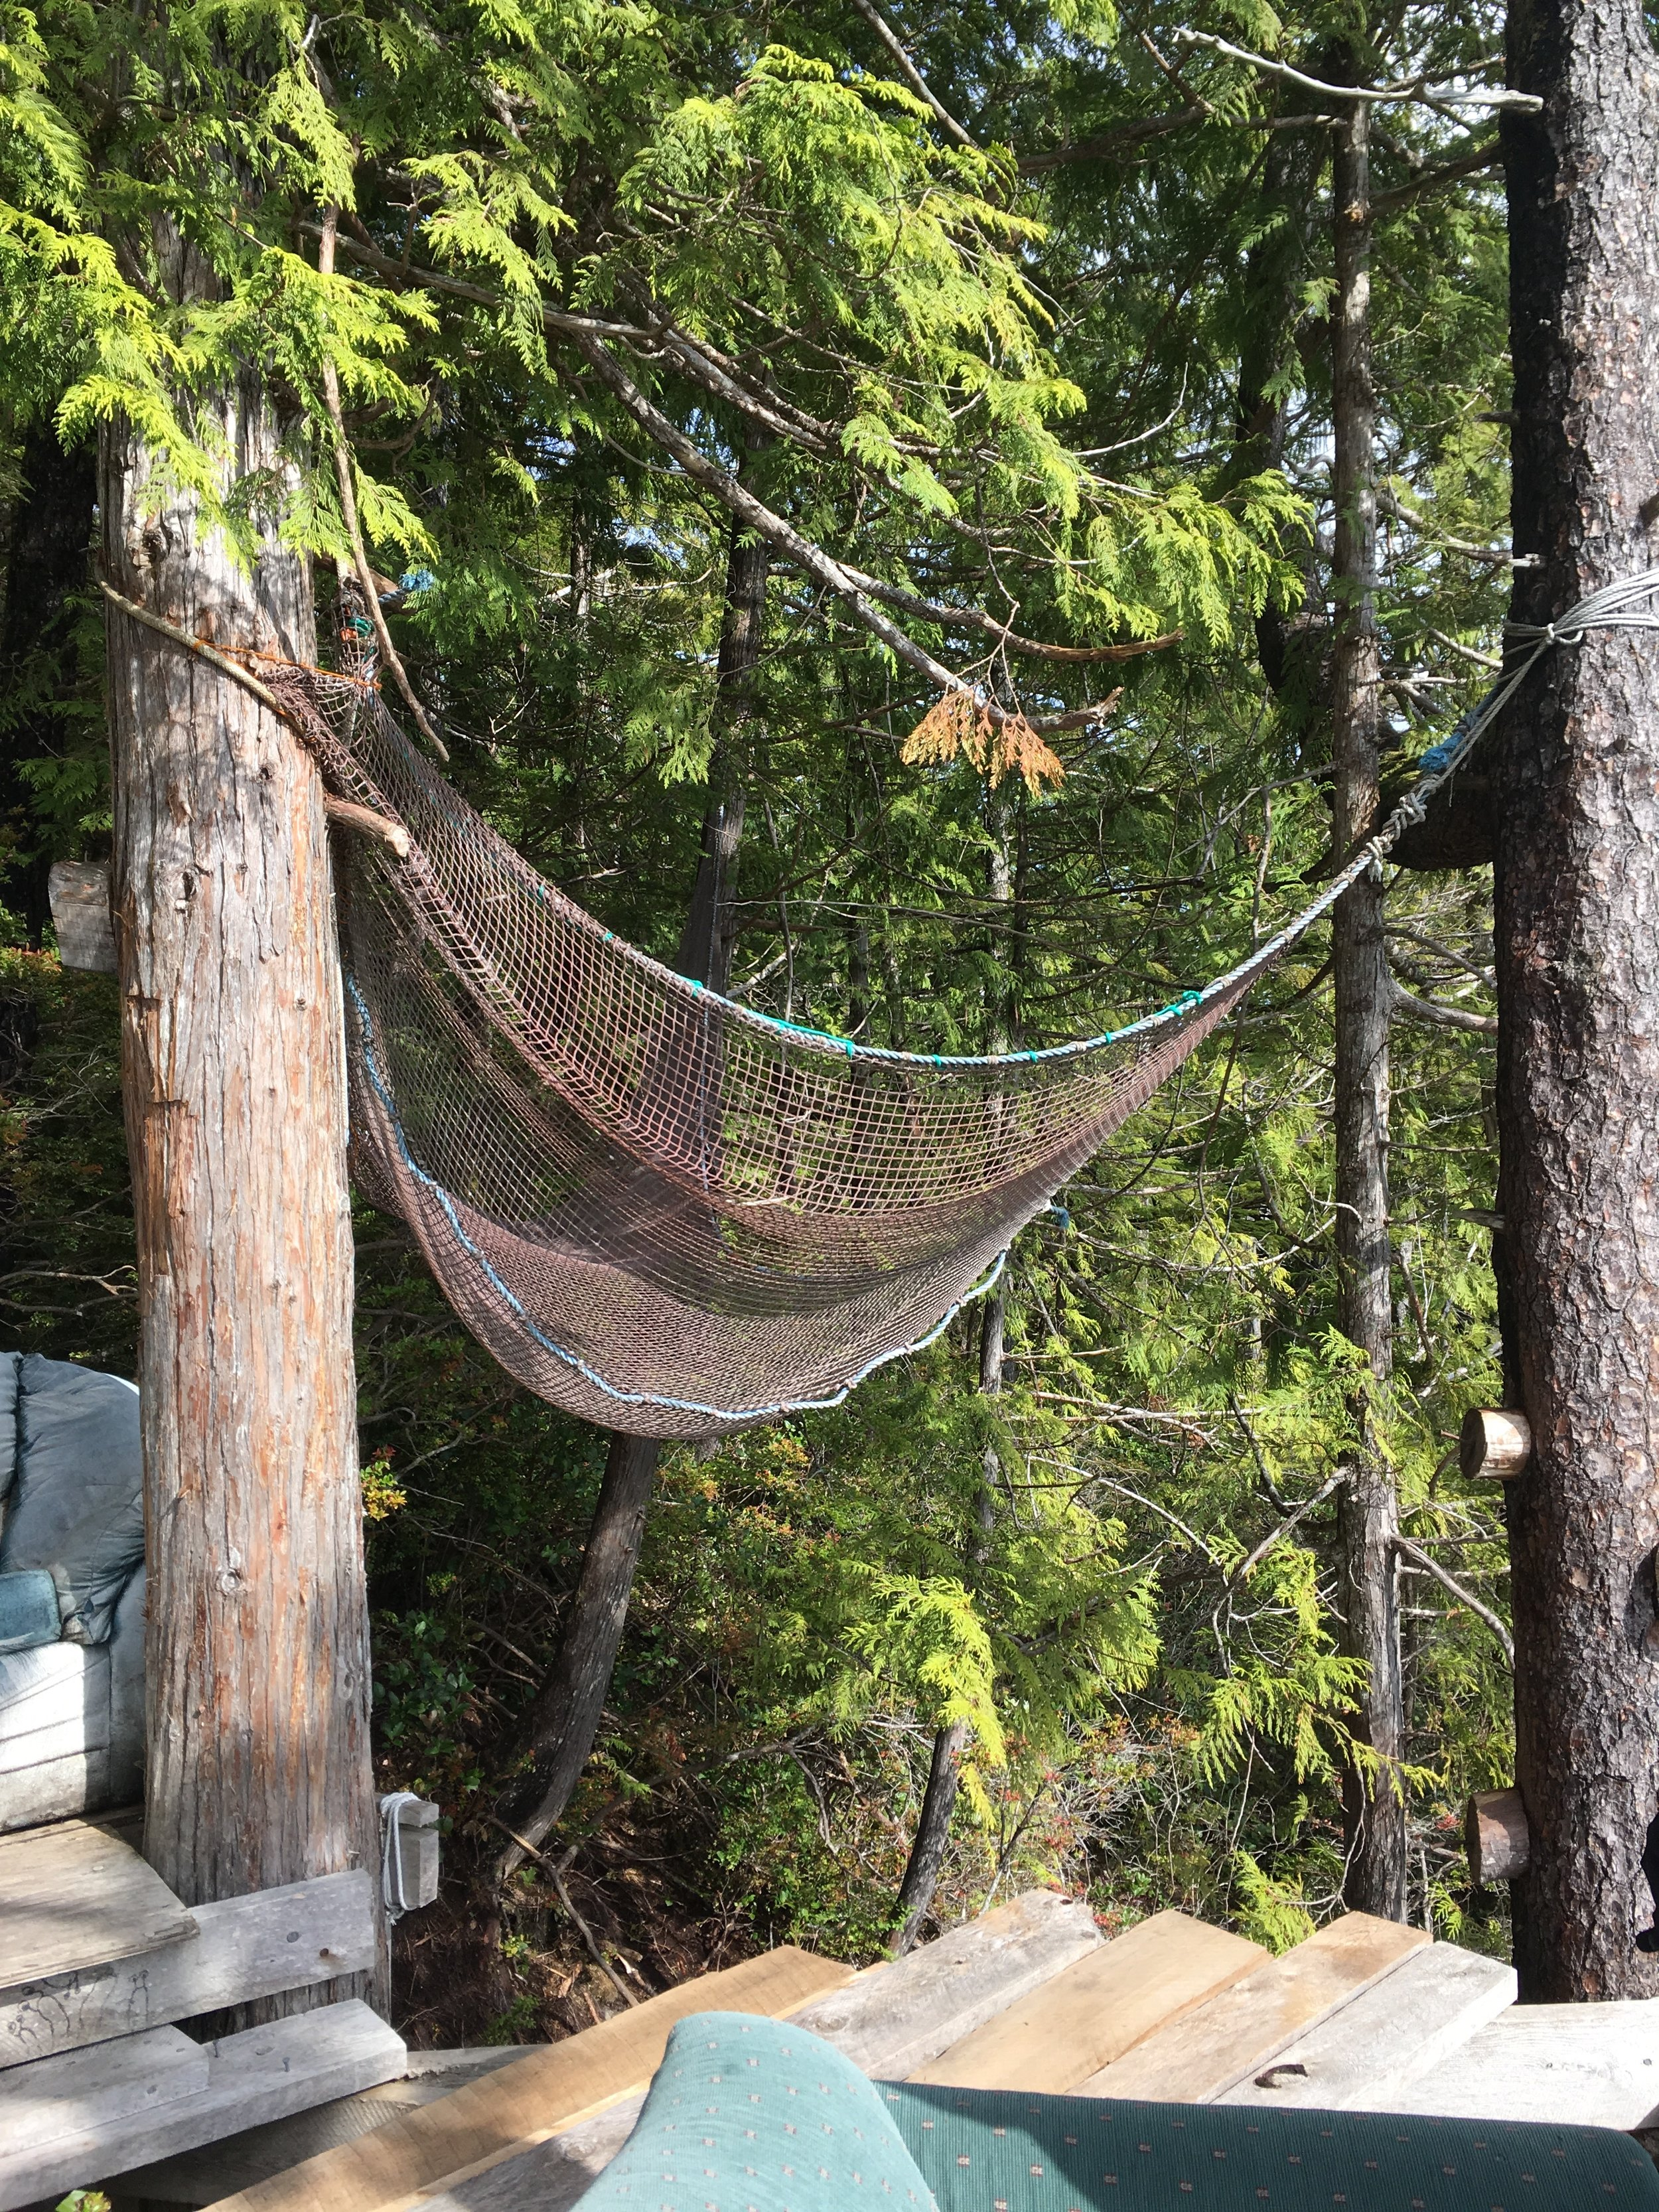 'The hammock'